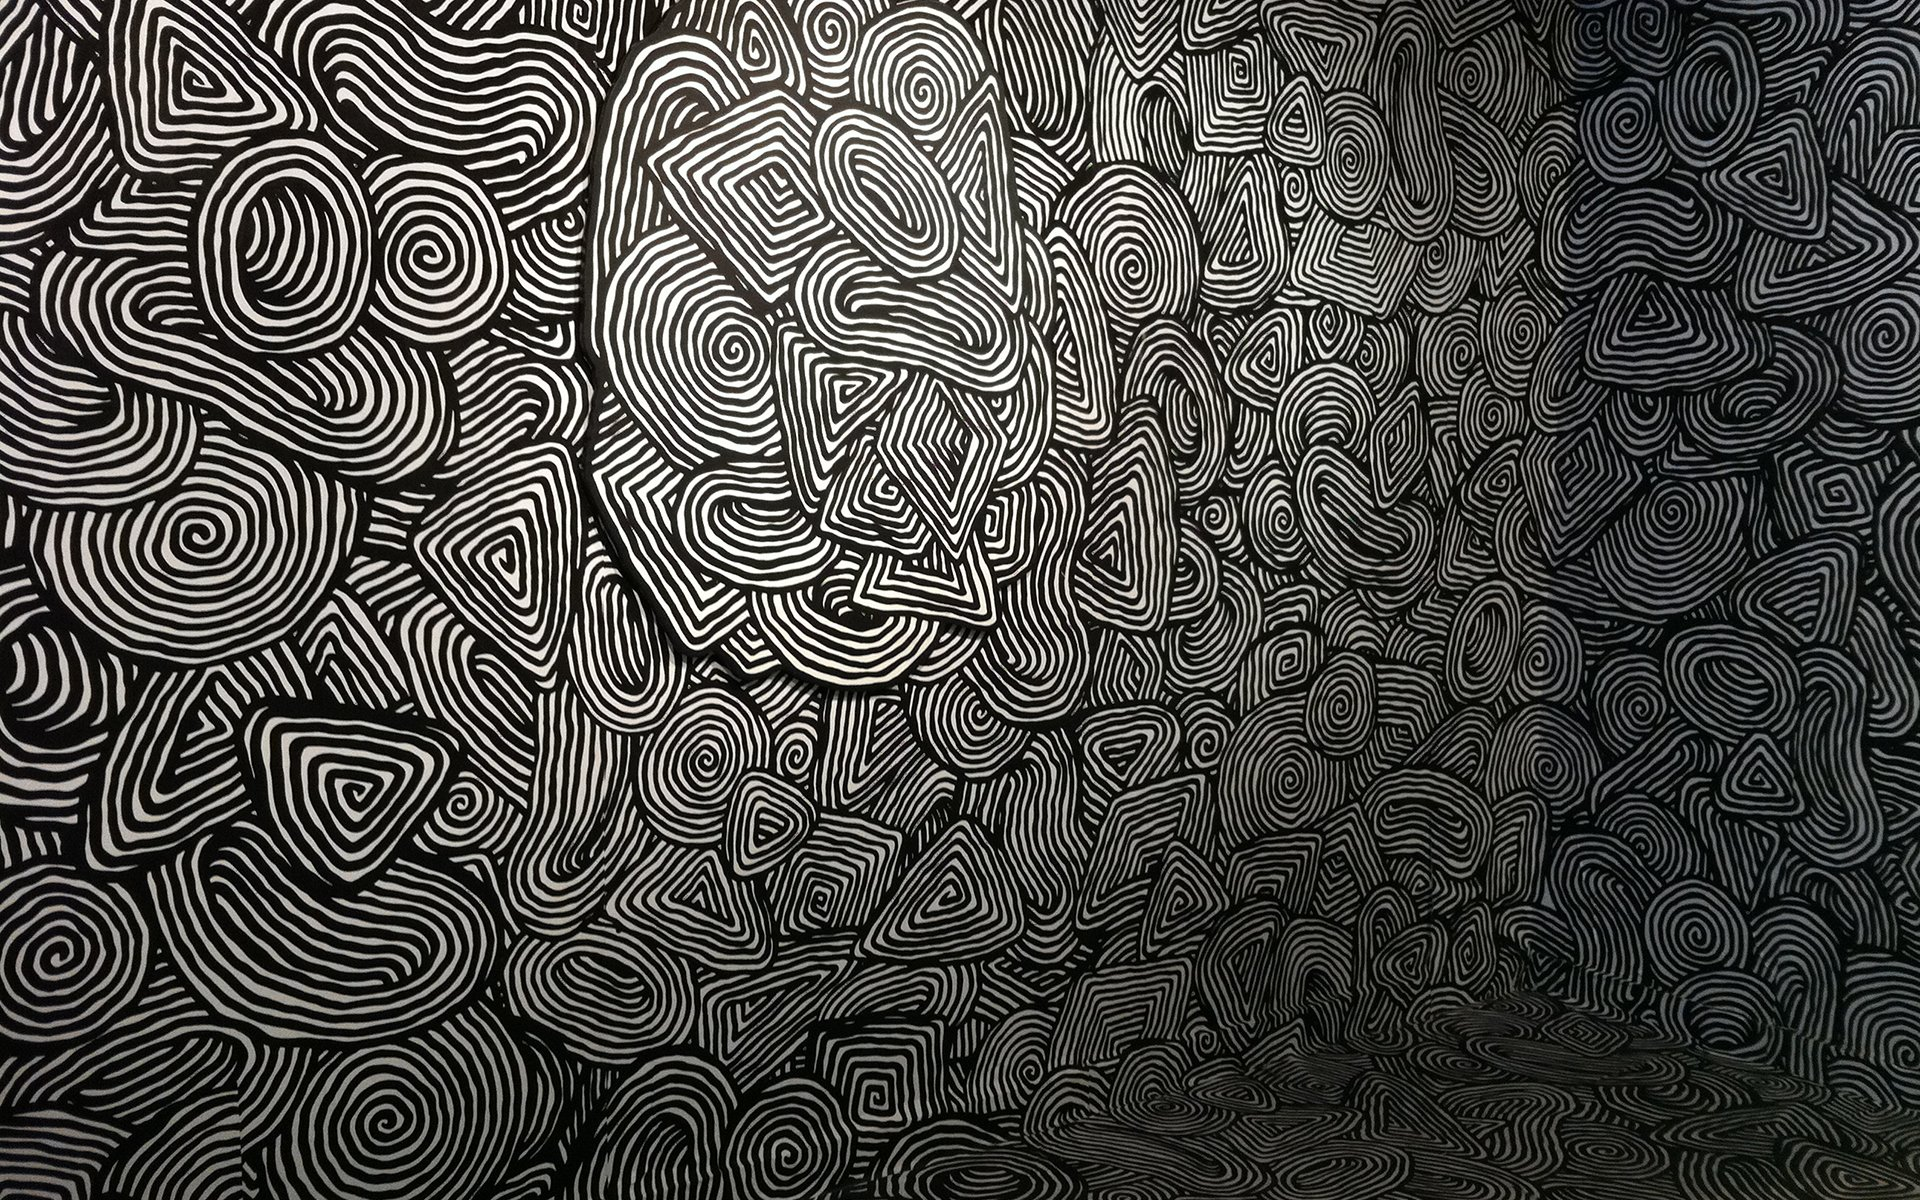 Fondo blanco y negro psicodelico rincon util for Fondo blanco wallpaper